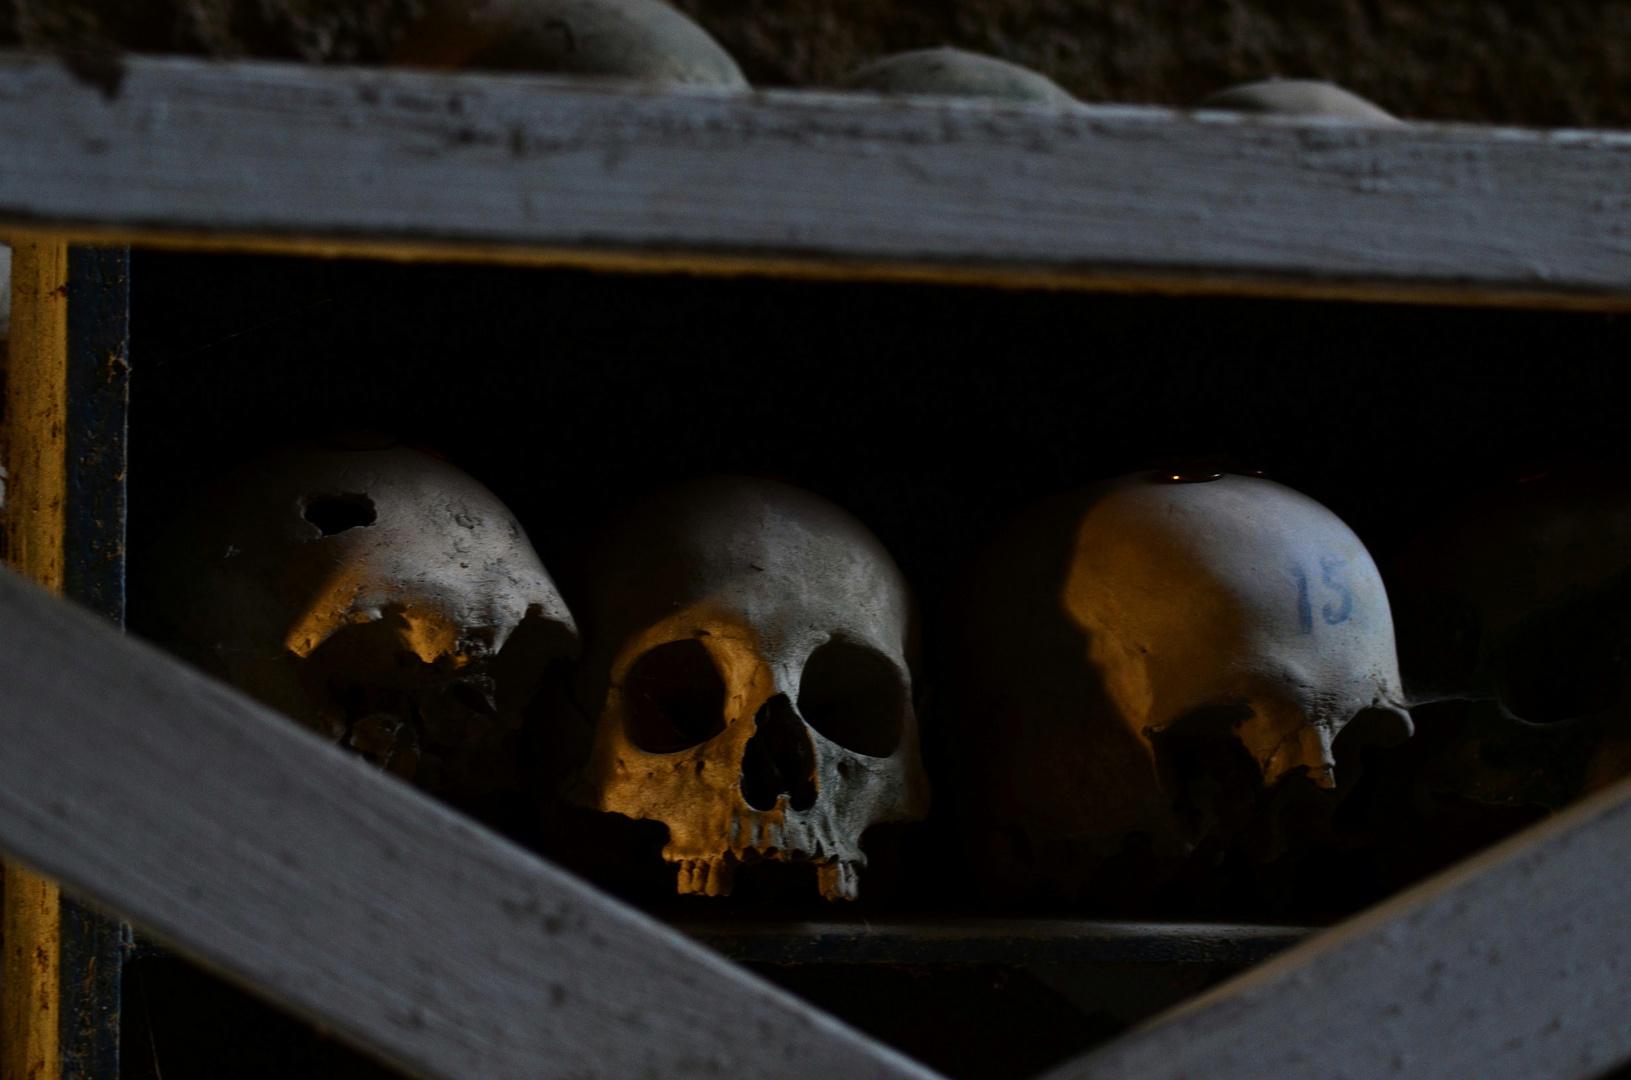 Memento Mori ... du wirst sterben